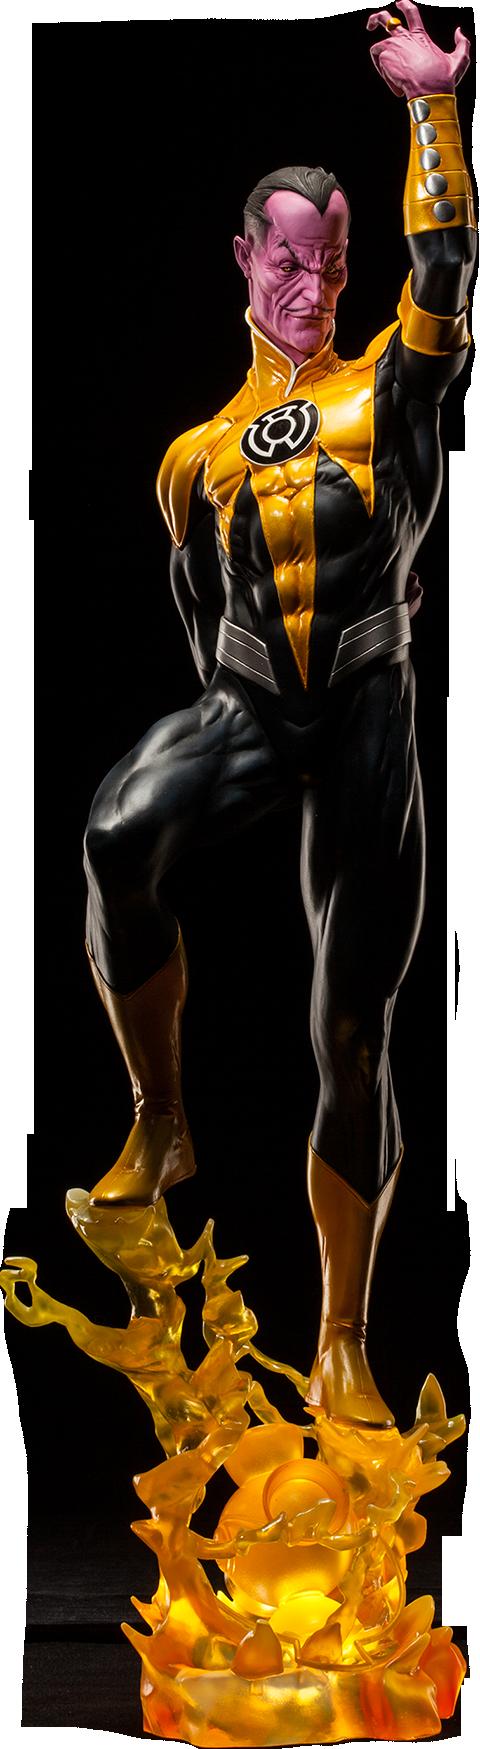 Sideshow Collectibles Sinestro Premium Format™ Figure